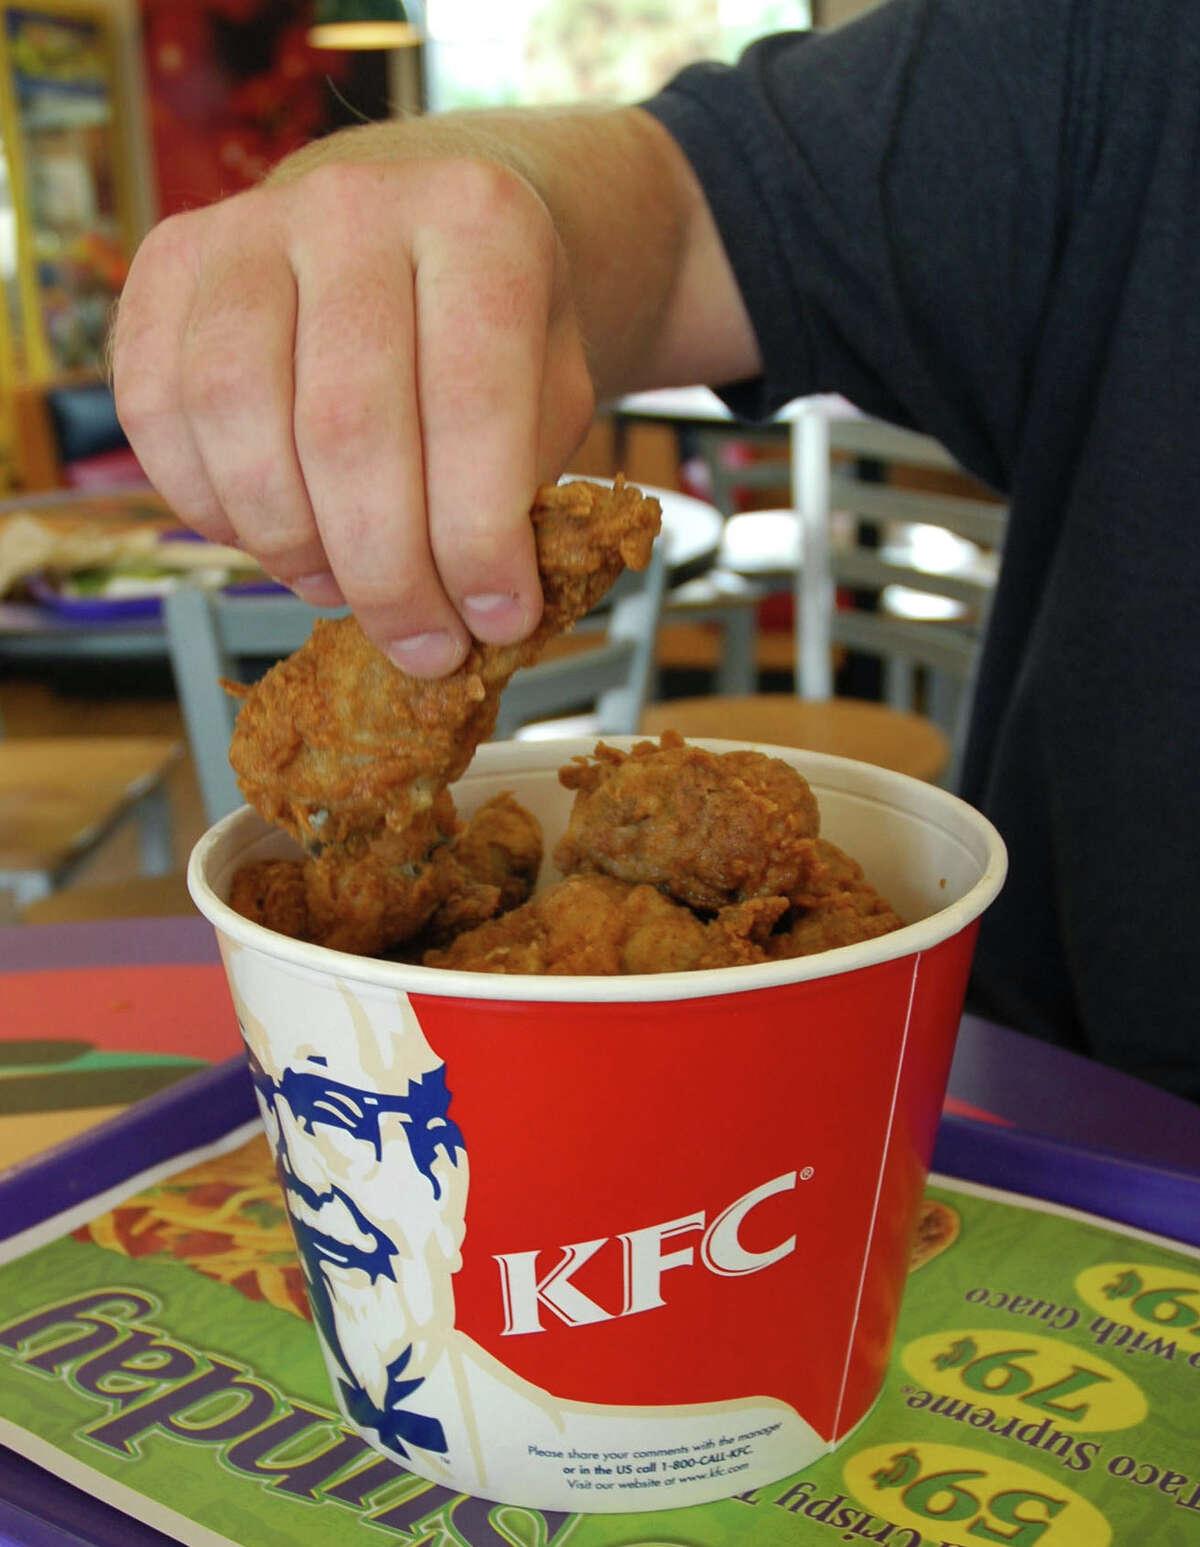 KFC Original RecipeDrumstick Calories (per drumstick): 120